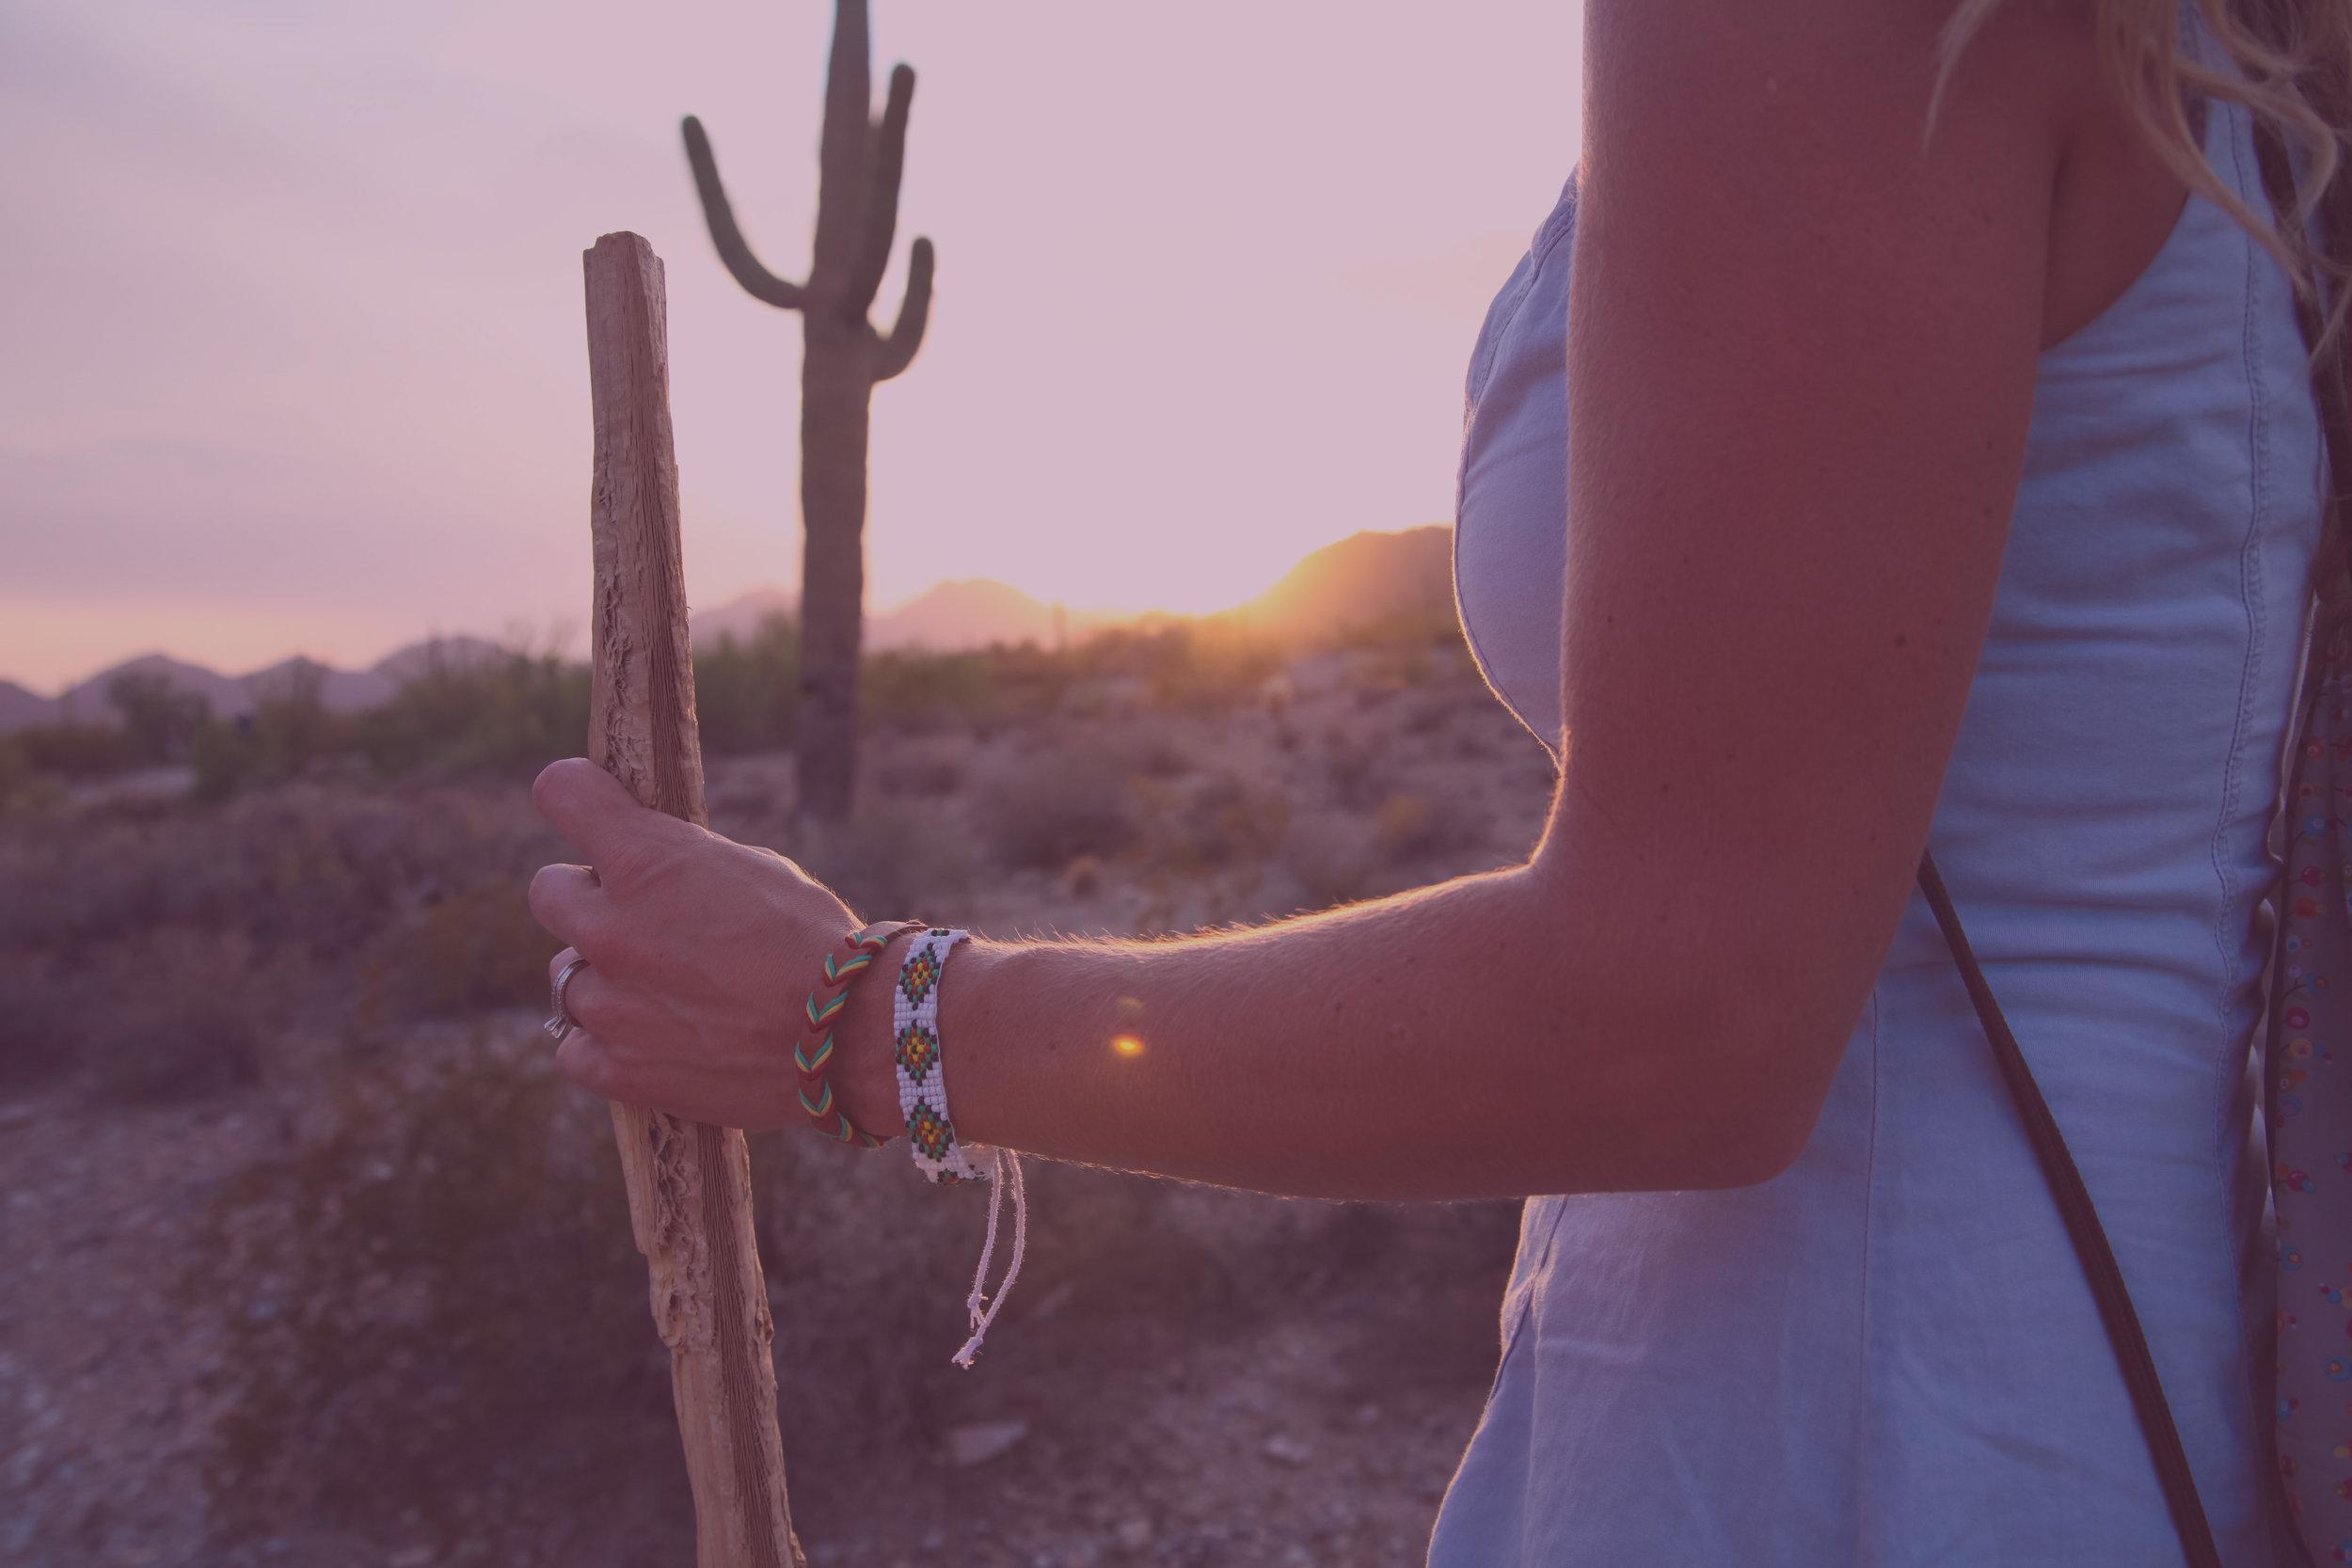 adventure-arm-bracelet-69098-revised.jpg